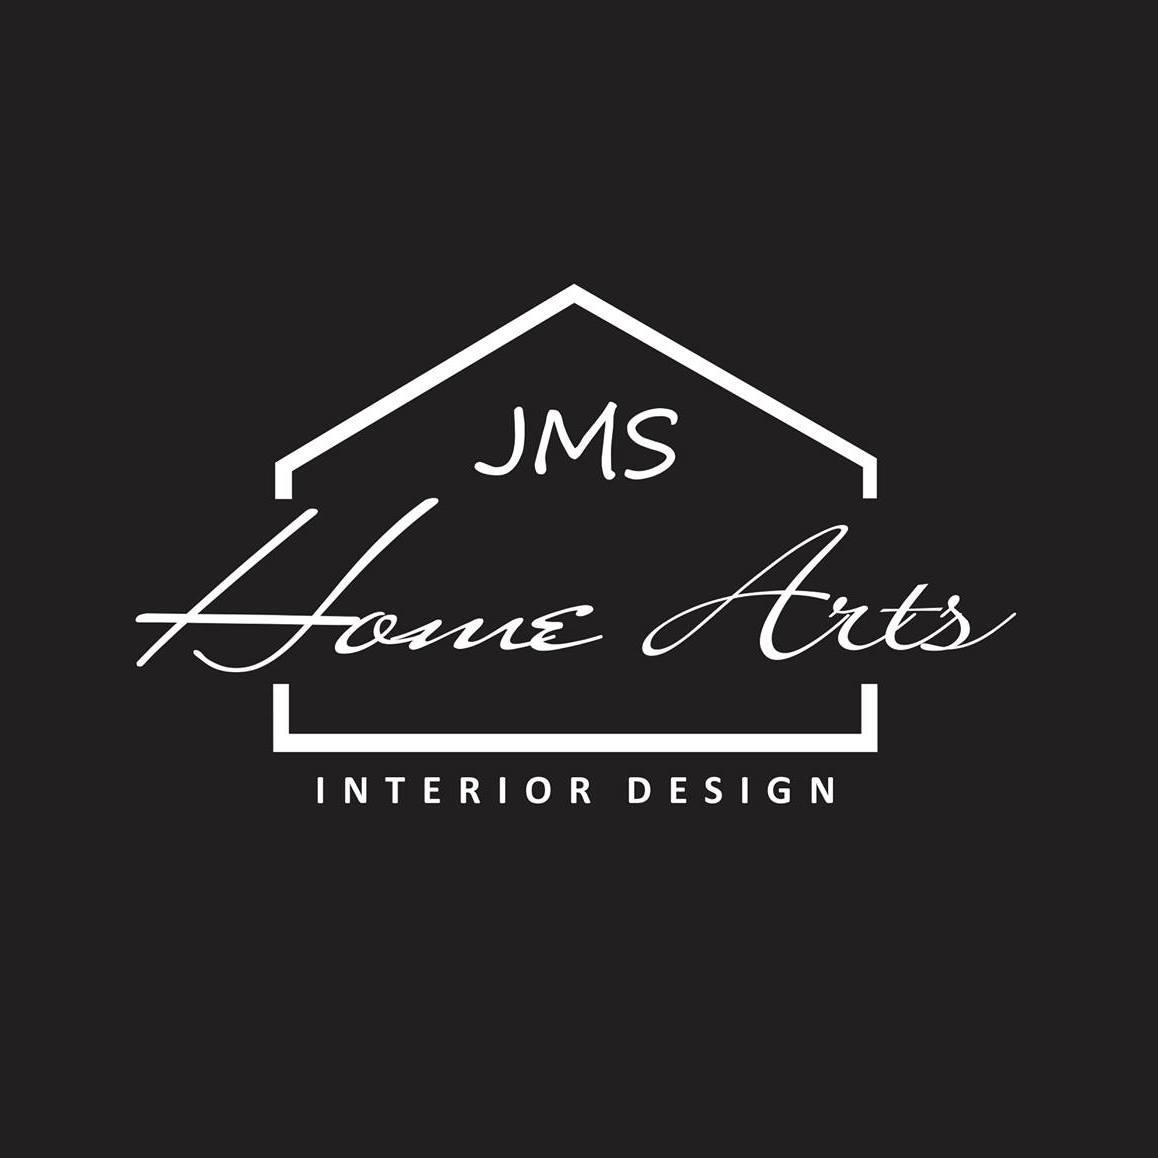 jms-home-arts-interior-design Logo